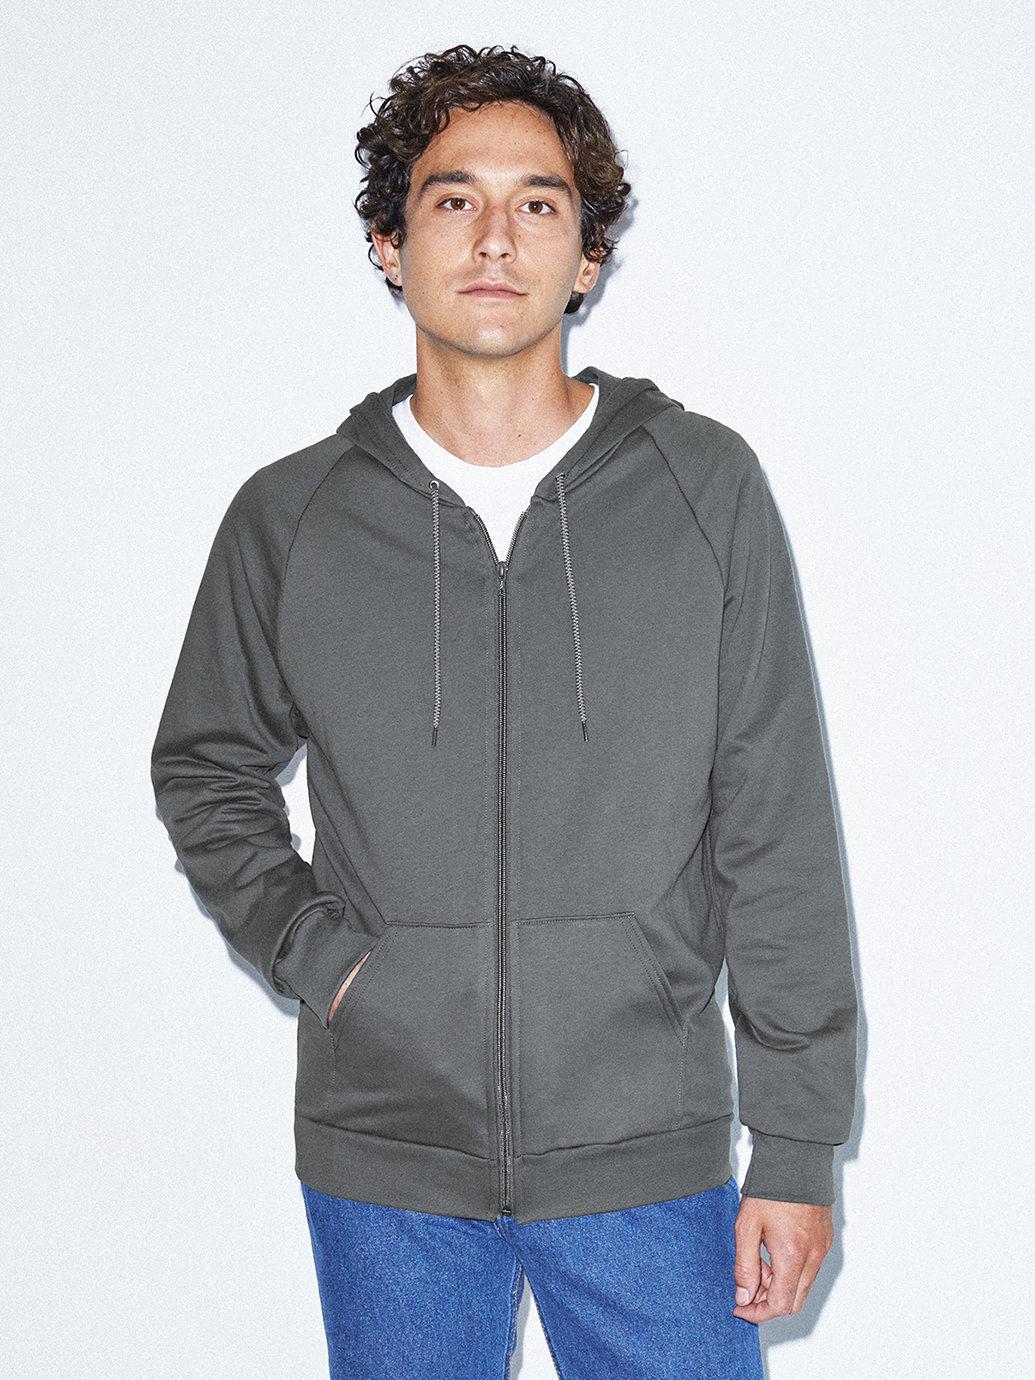 American Apparel California Fleece Zip Hoodie (various colors)